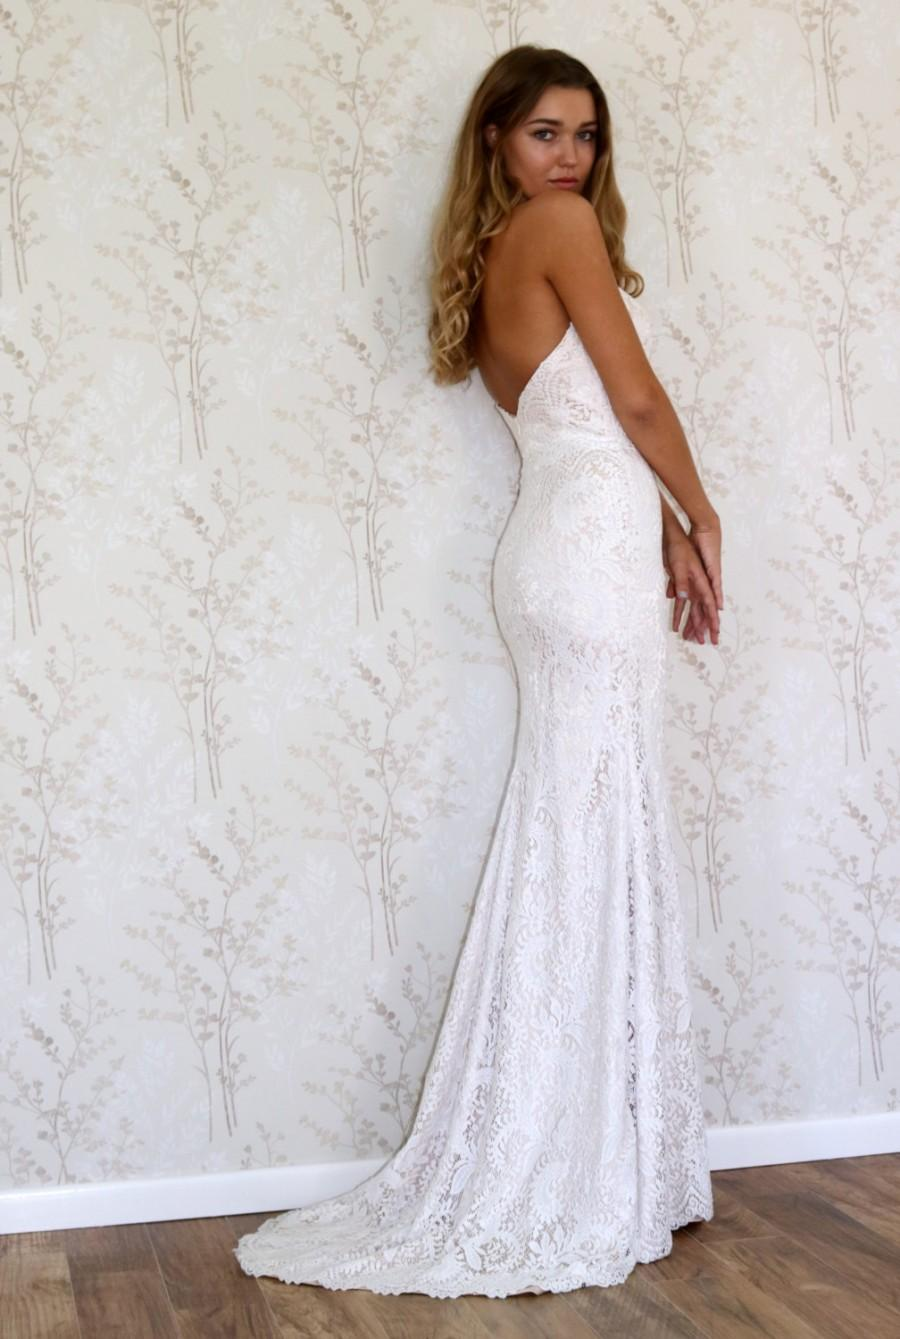 chic bohemian wedding dresses made to perfection simple bohemian wedding dresses bohemian wedding dresses 6 km